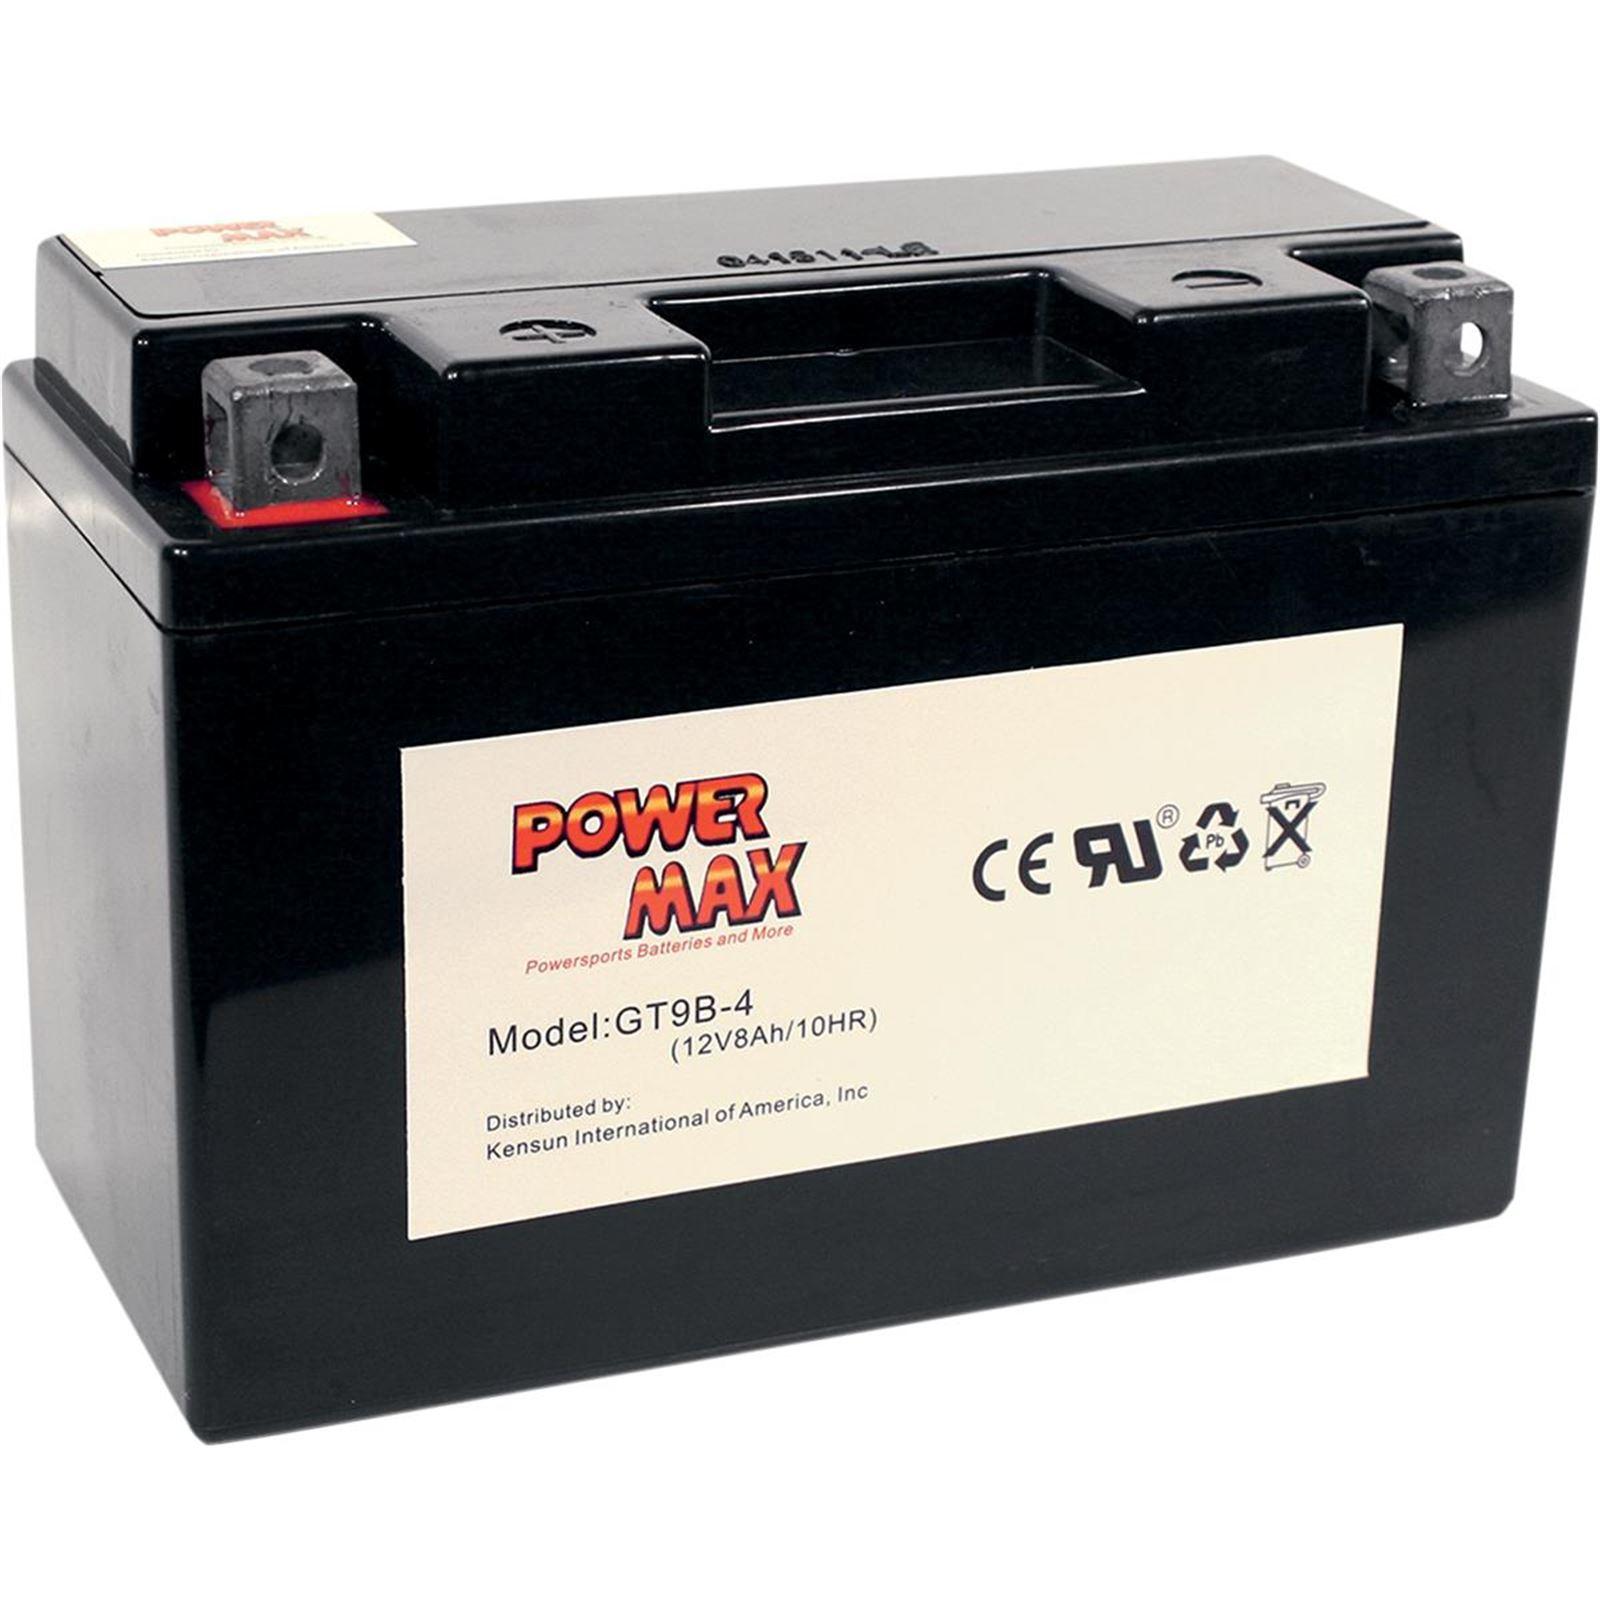 Power Max Battery - YT9B-4